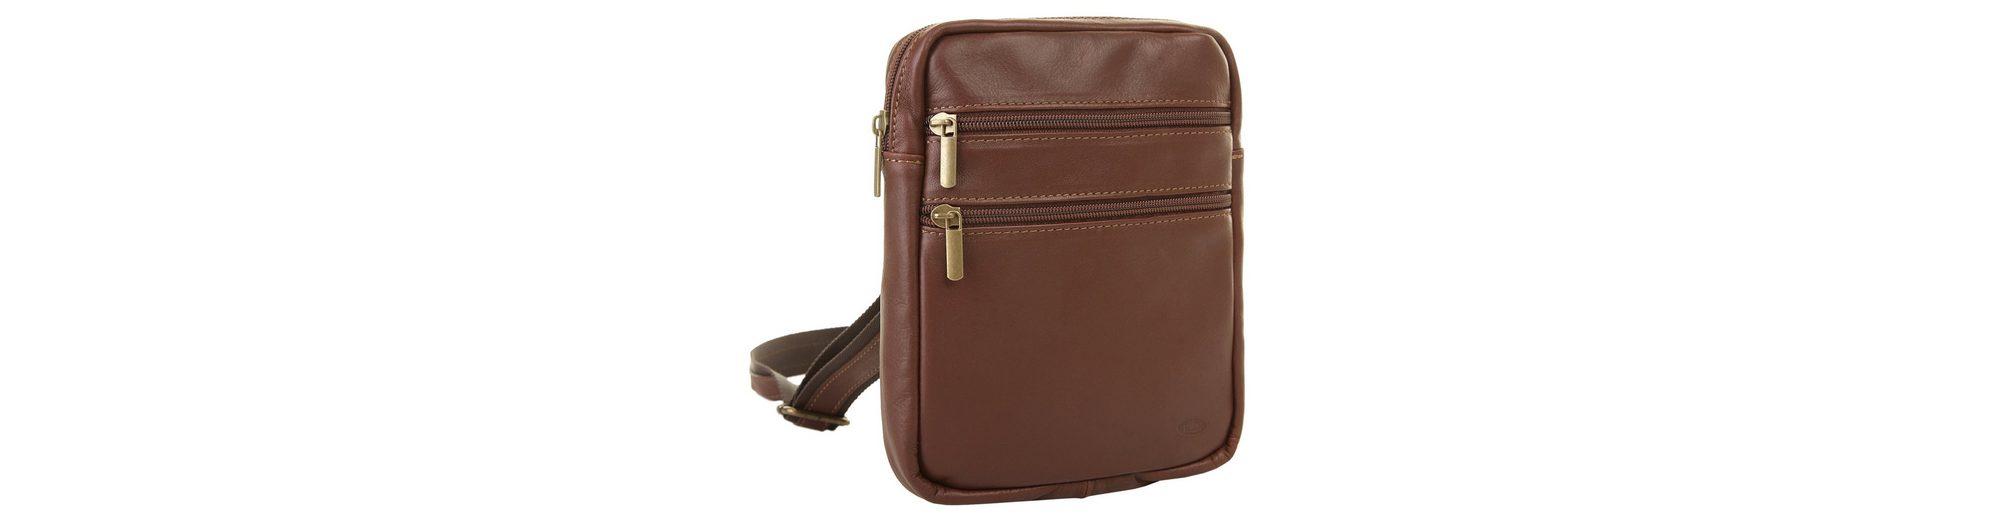 piké Crossover Bag Grau-Outlet-Store Online Perfekt 5A4U0MoxyI